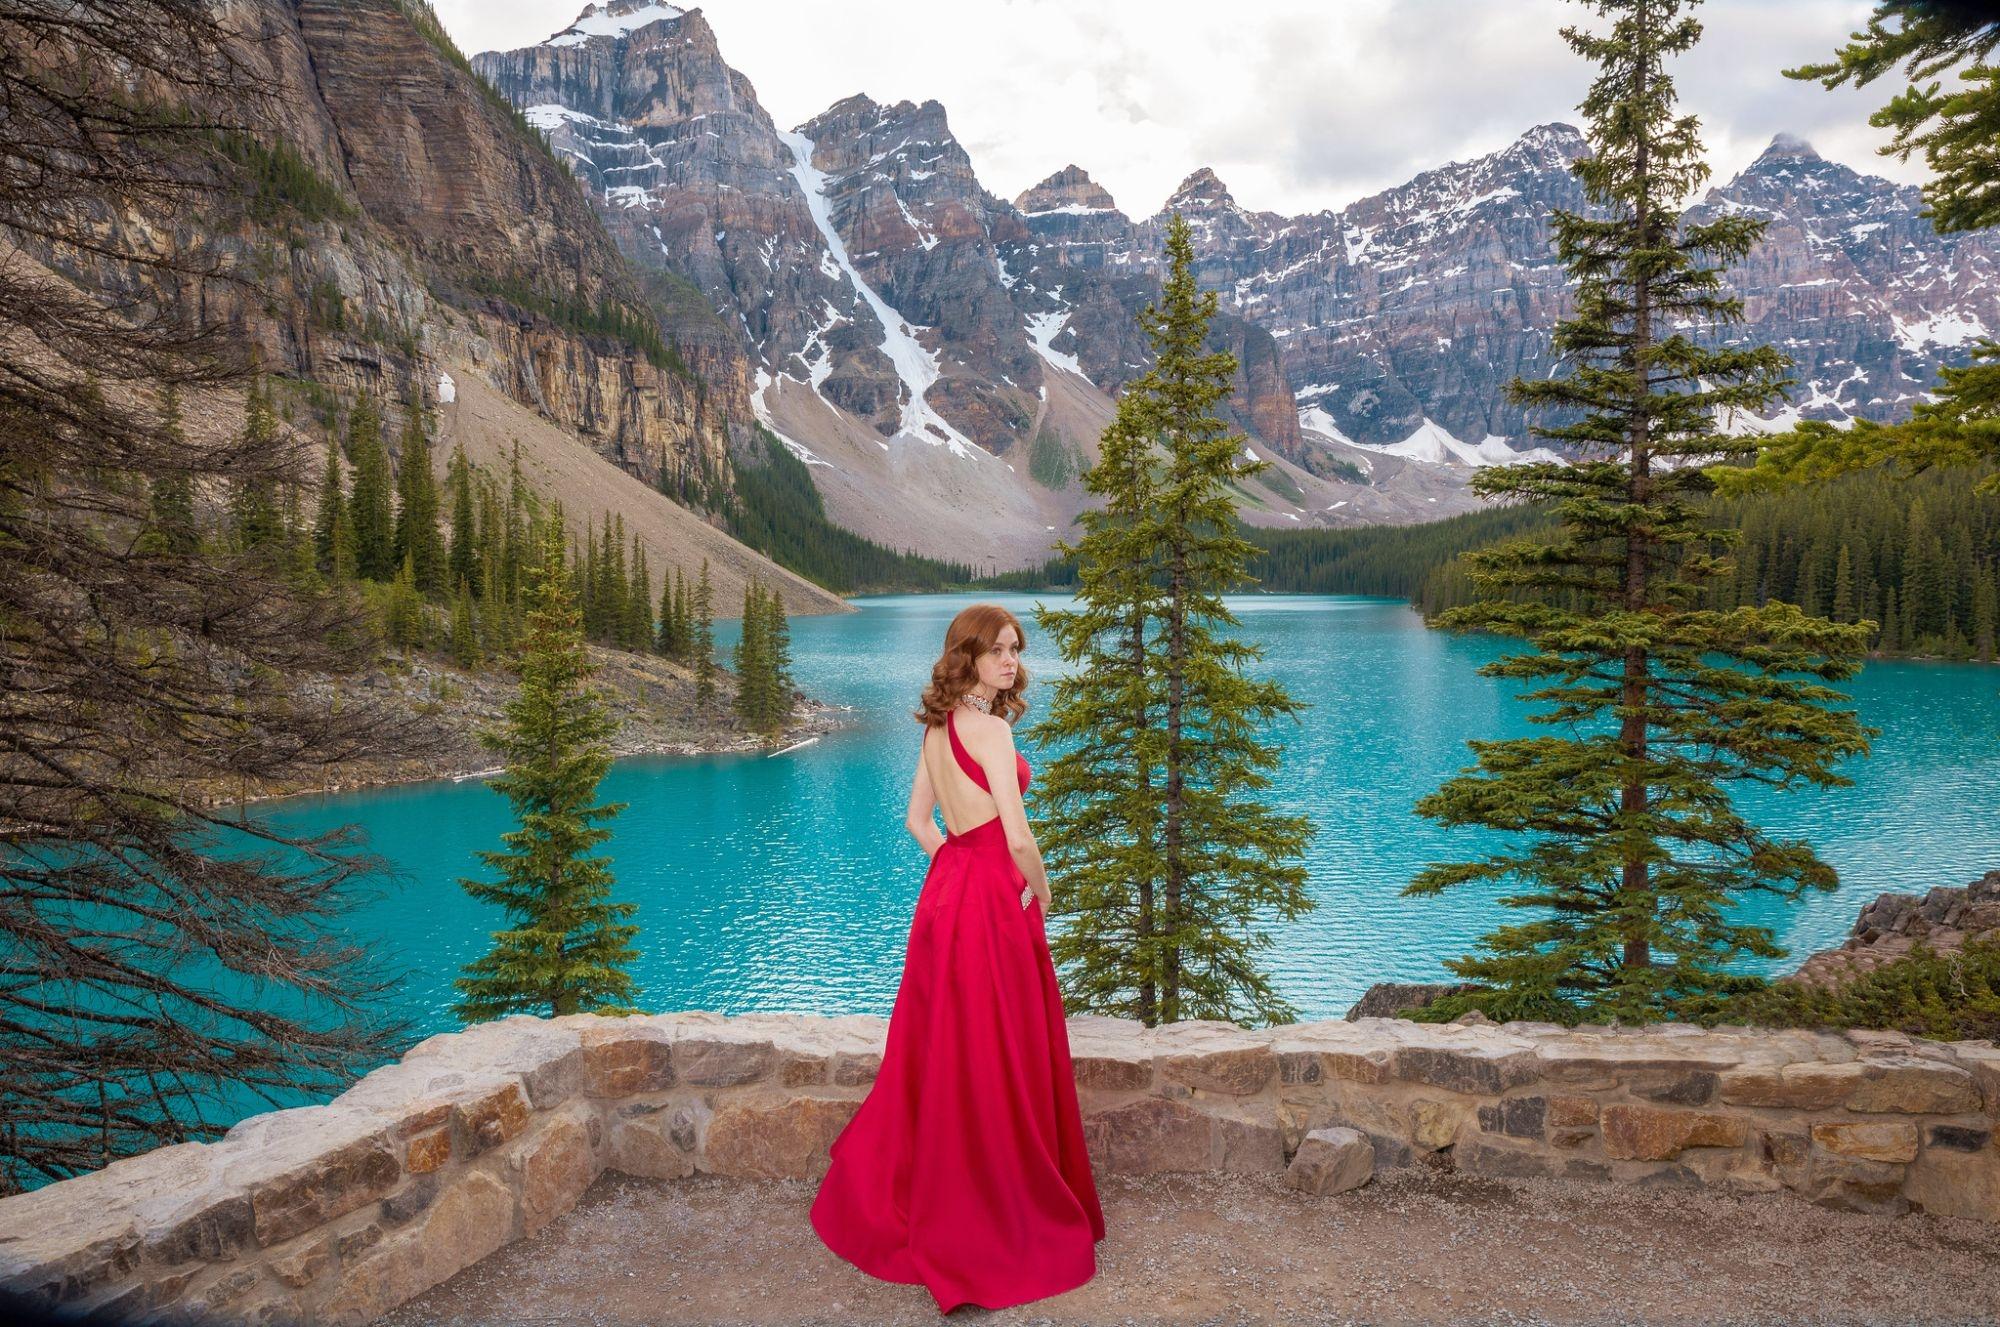 Christy Turner Photography/Aurora Media Wedding & Engagement Photography Cover Image